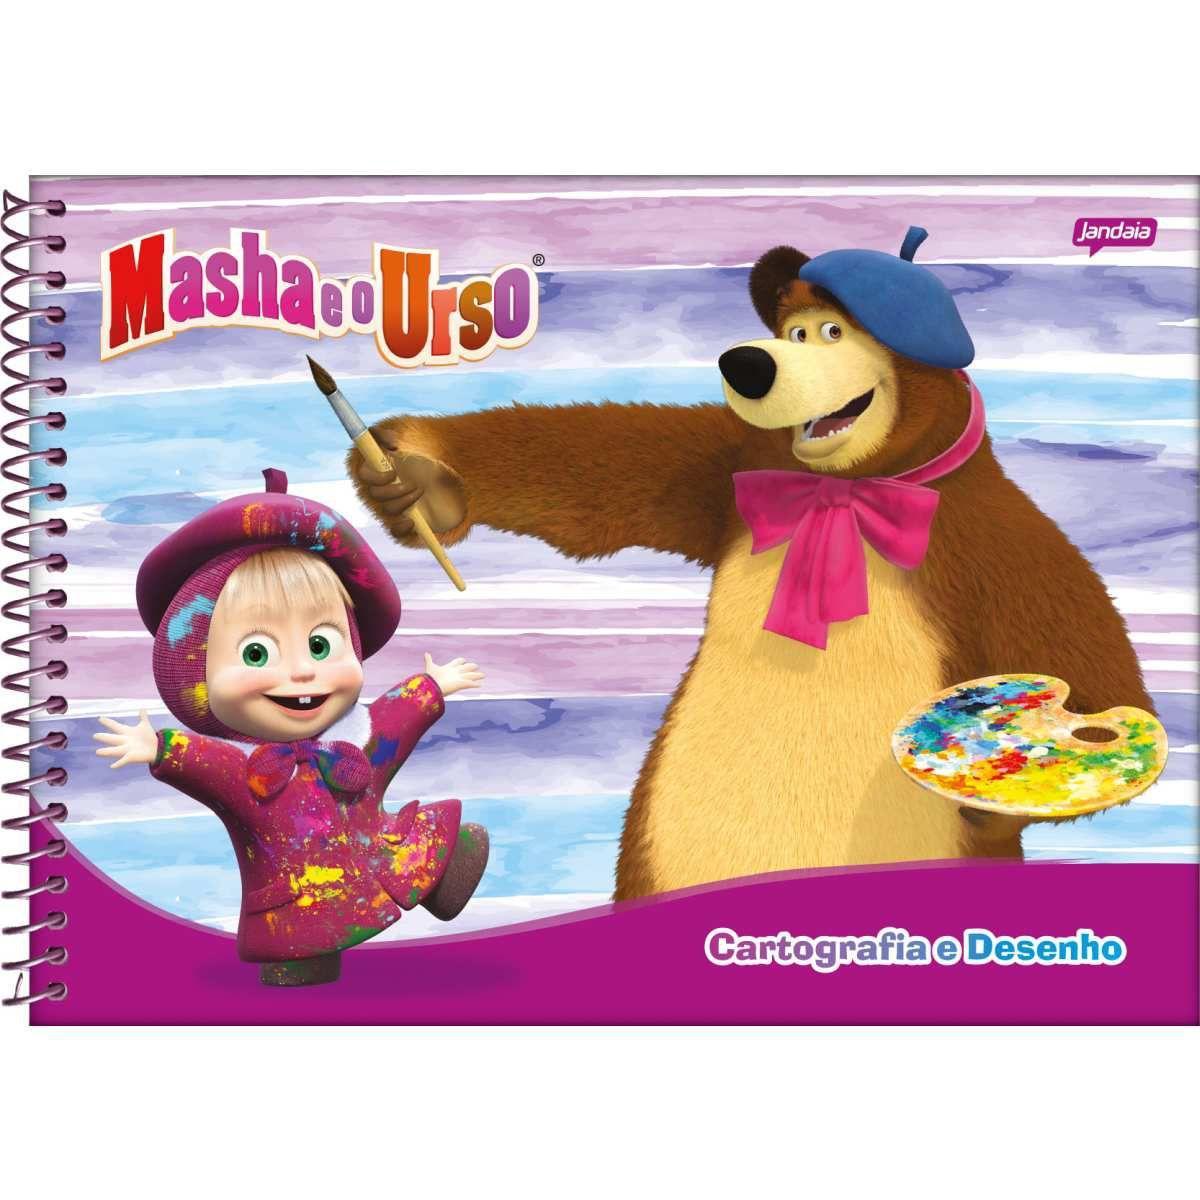 Novo Episodio De Masha E O Urso Bate Recorde No Youtube Assista